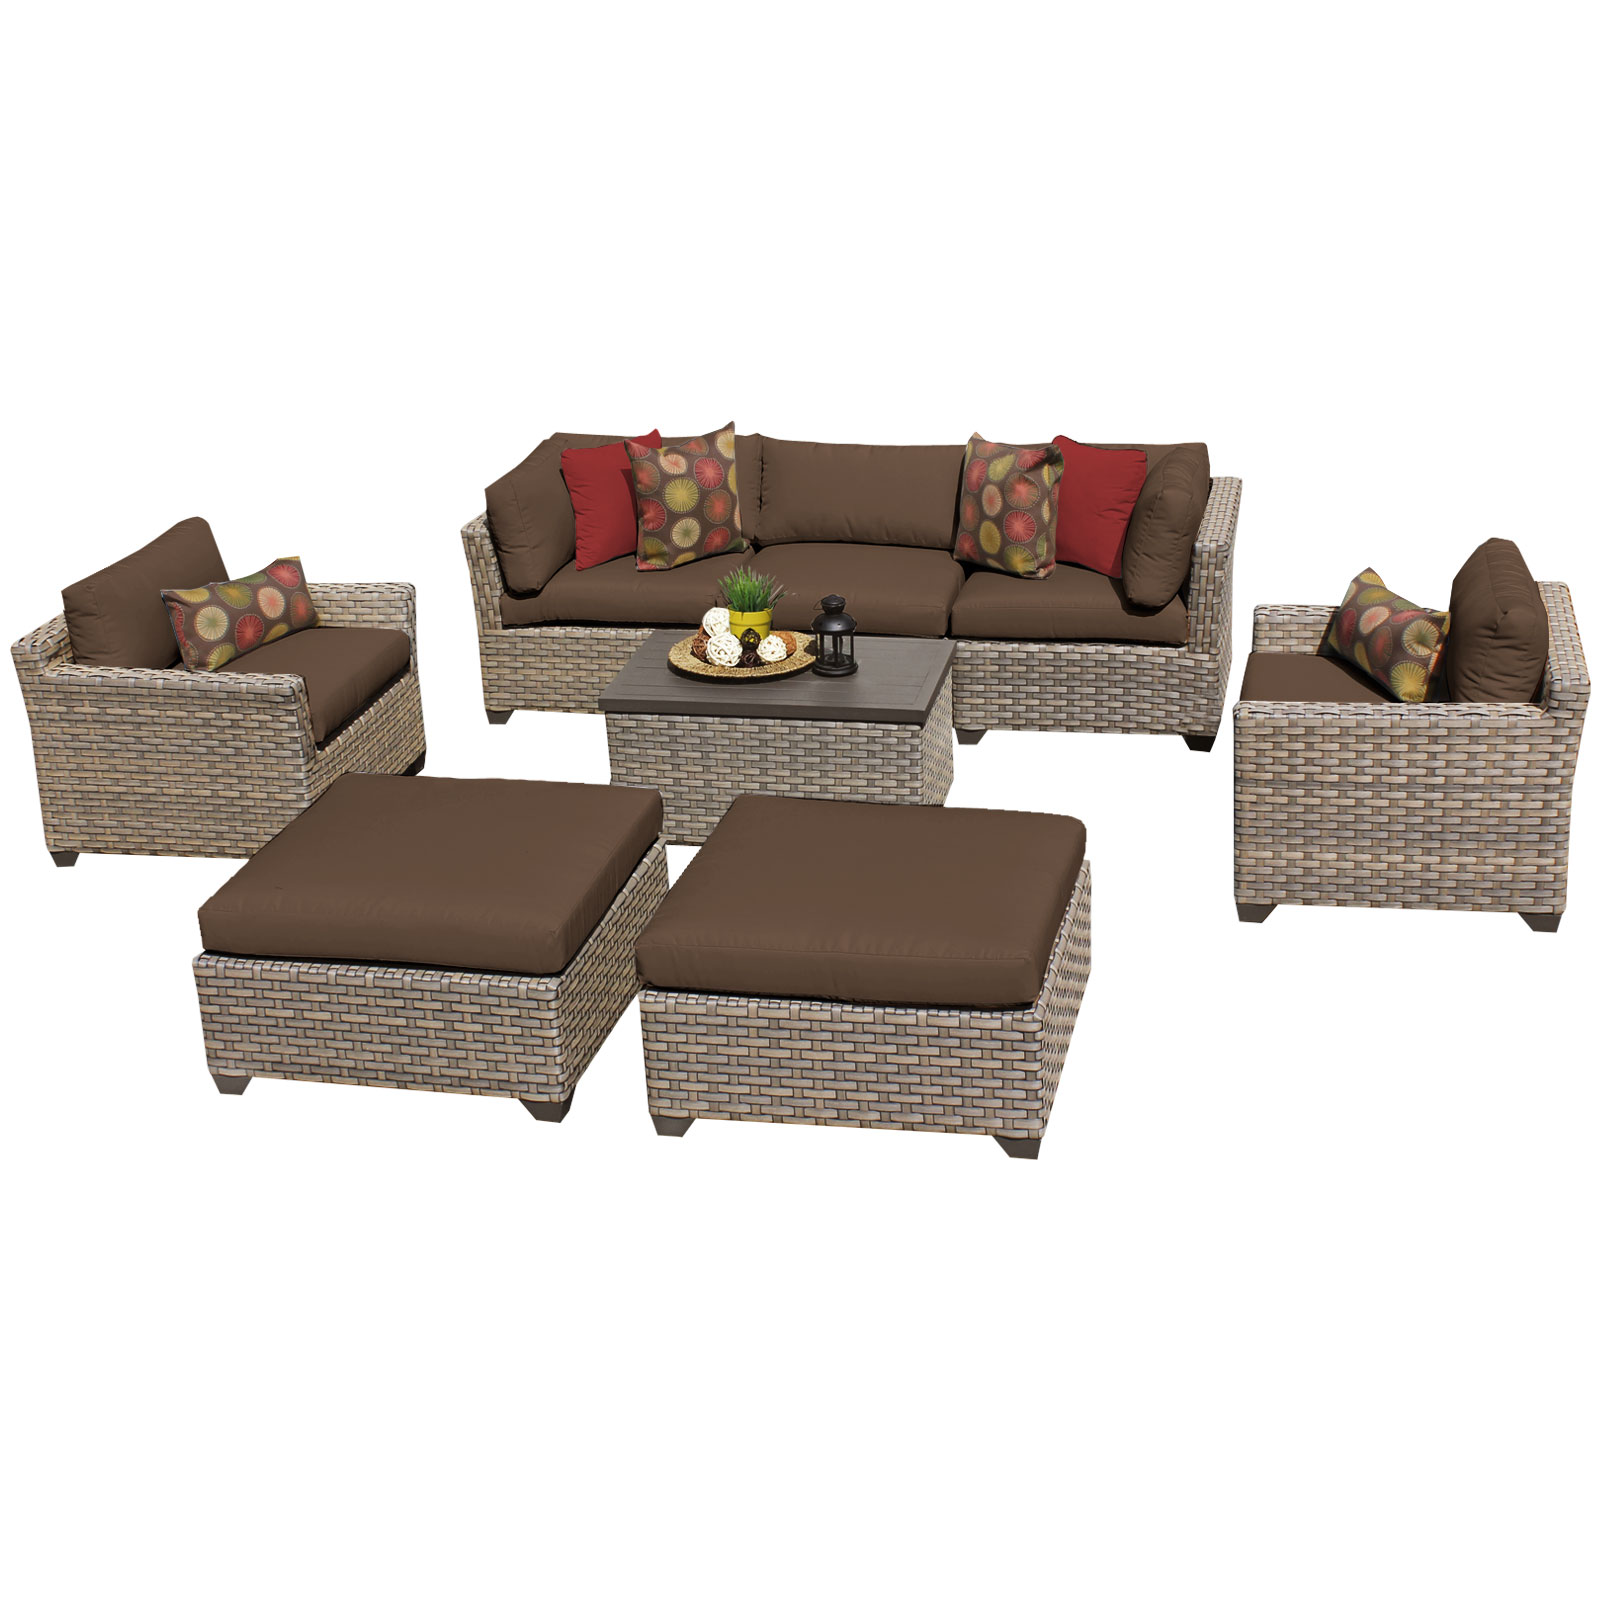 Hampton 8 Piece Outdoor Wicker Patio Furniture Set 08a by TK Classics